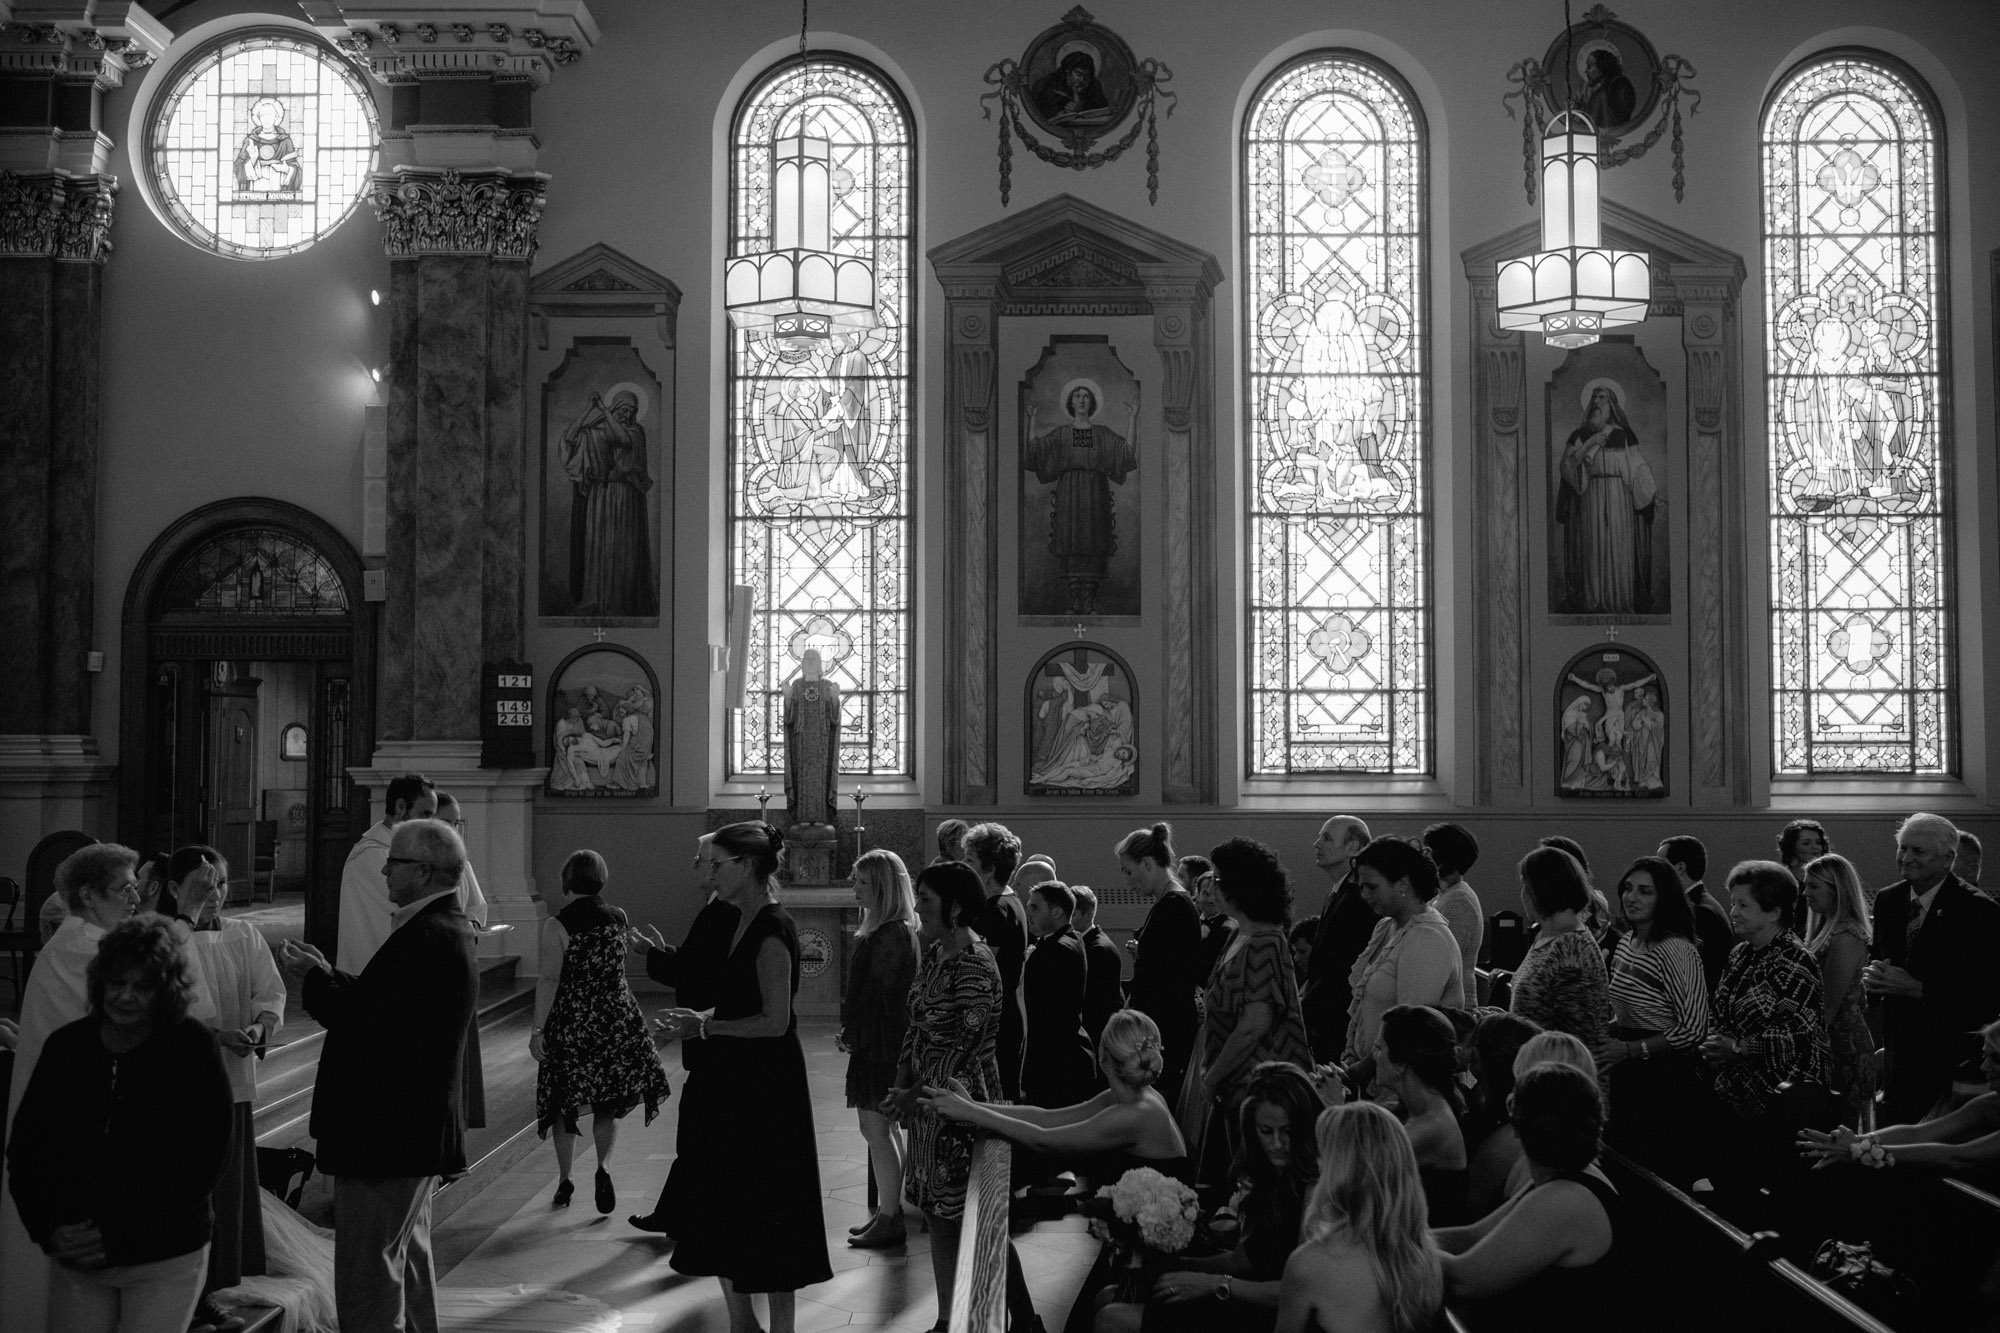 mia-josh-scranton-wedding-photography-052